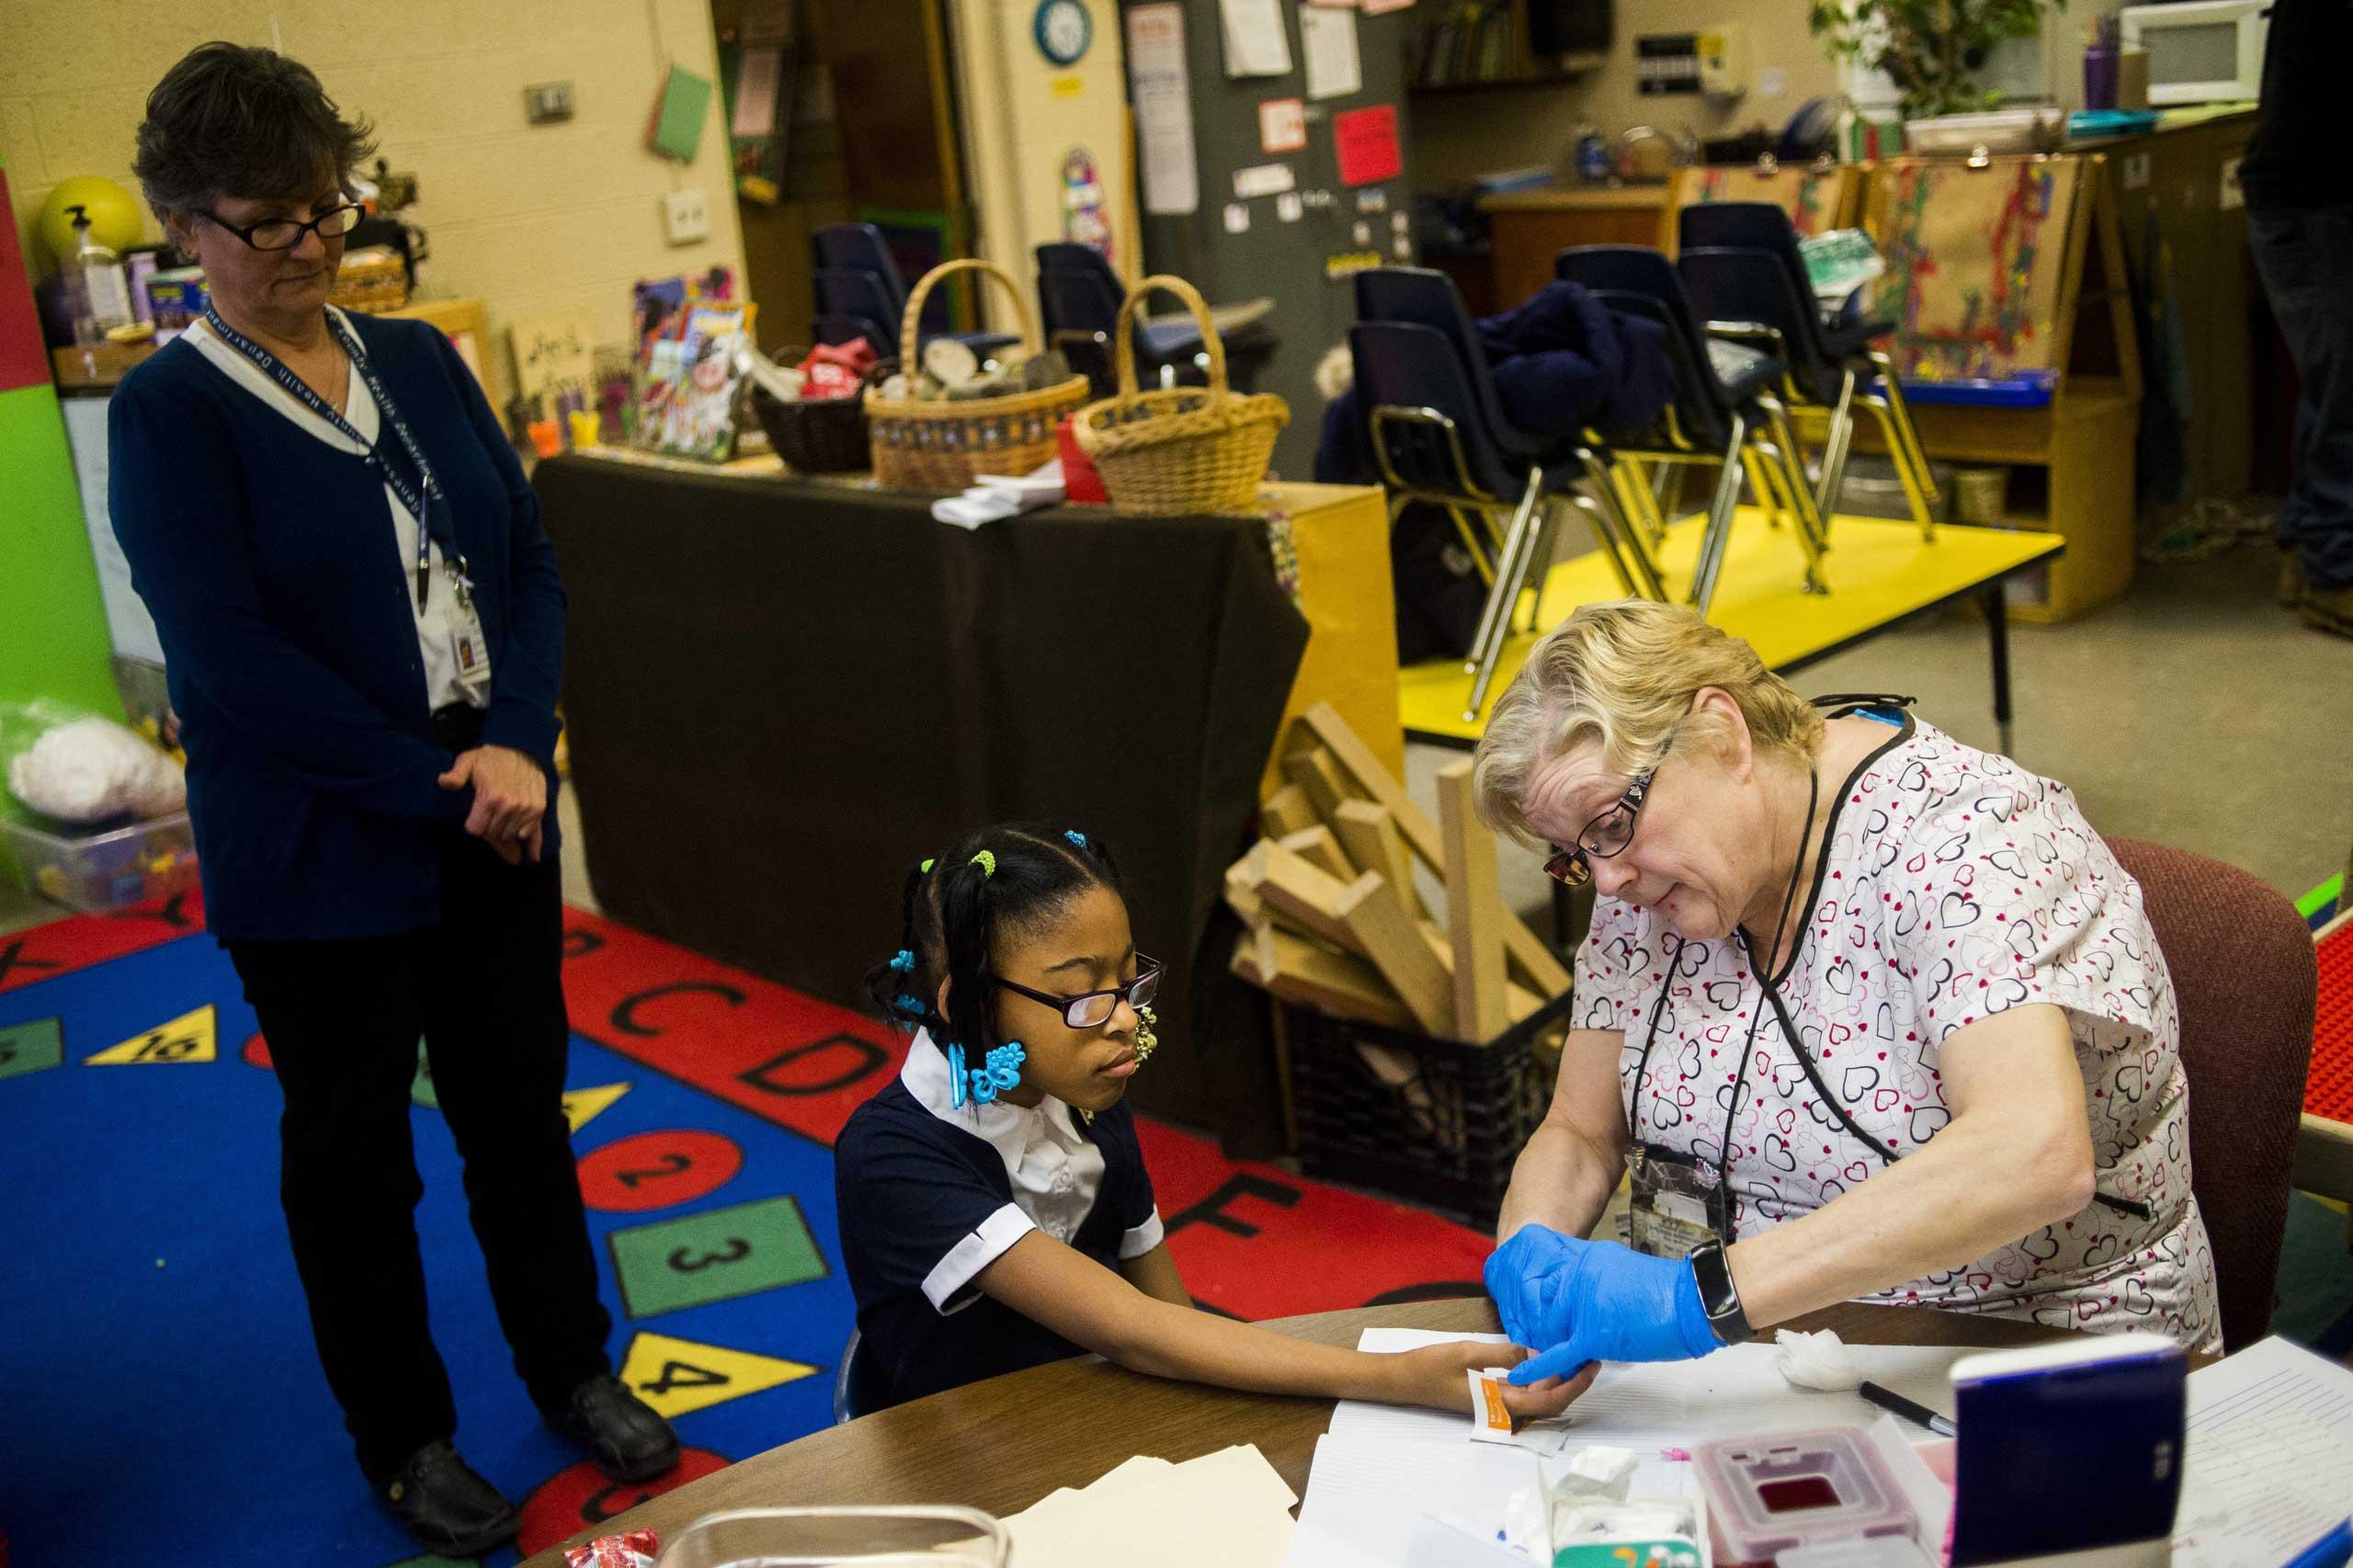 LaShanti Redmond, 10, of Flint, gets her finger poked to test her blood for lead levels at Freeman Elementary School in Flint, Mich., Jan. 12, 2016.